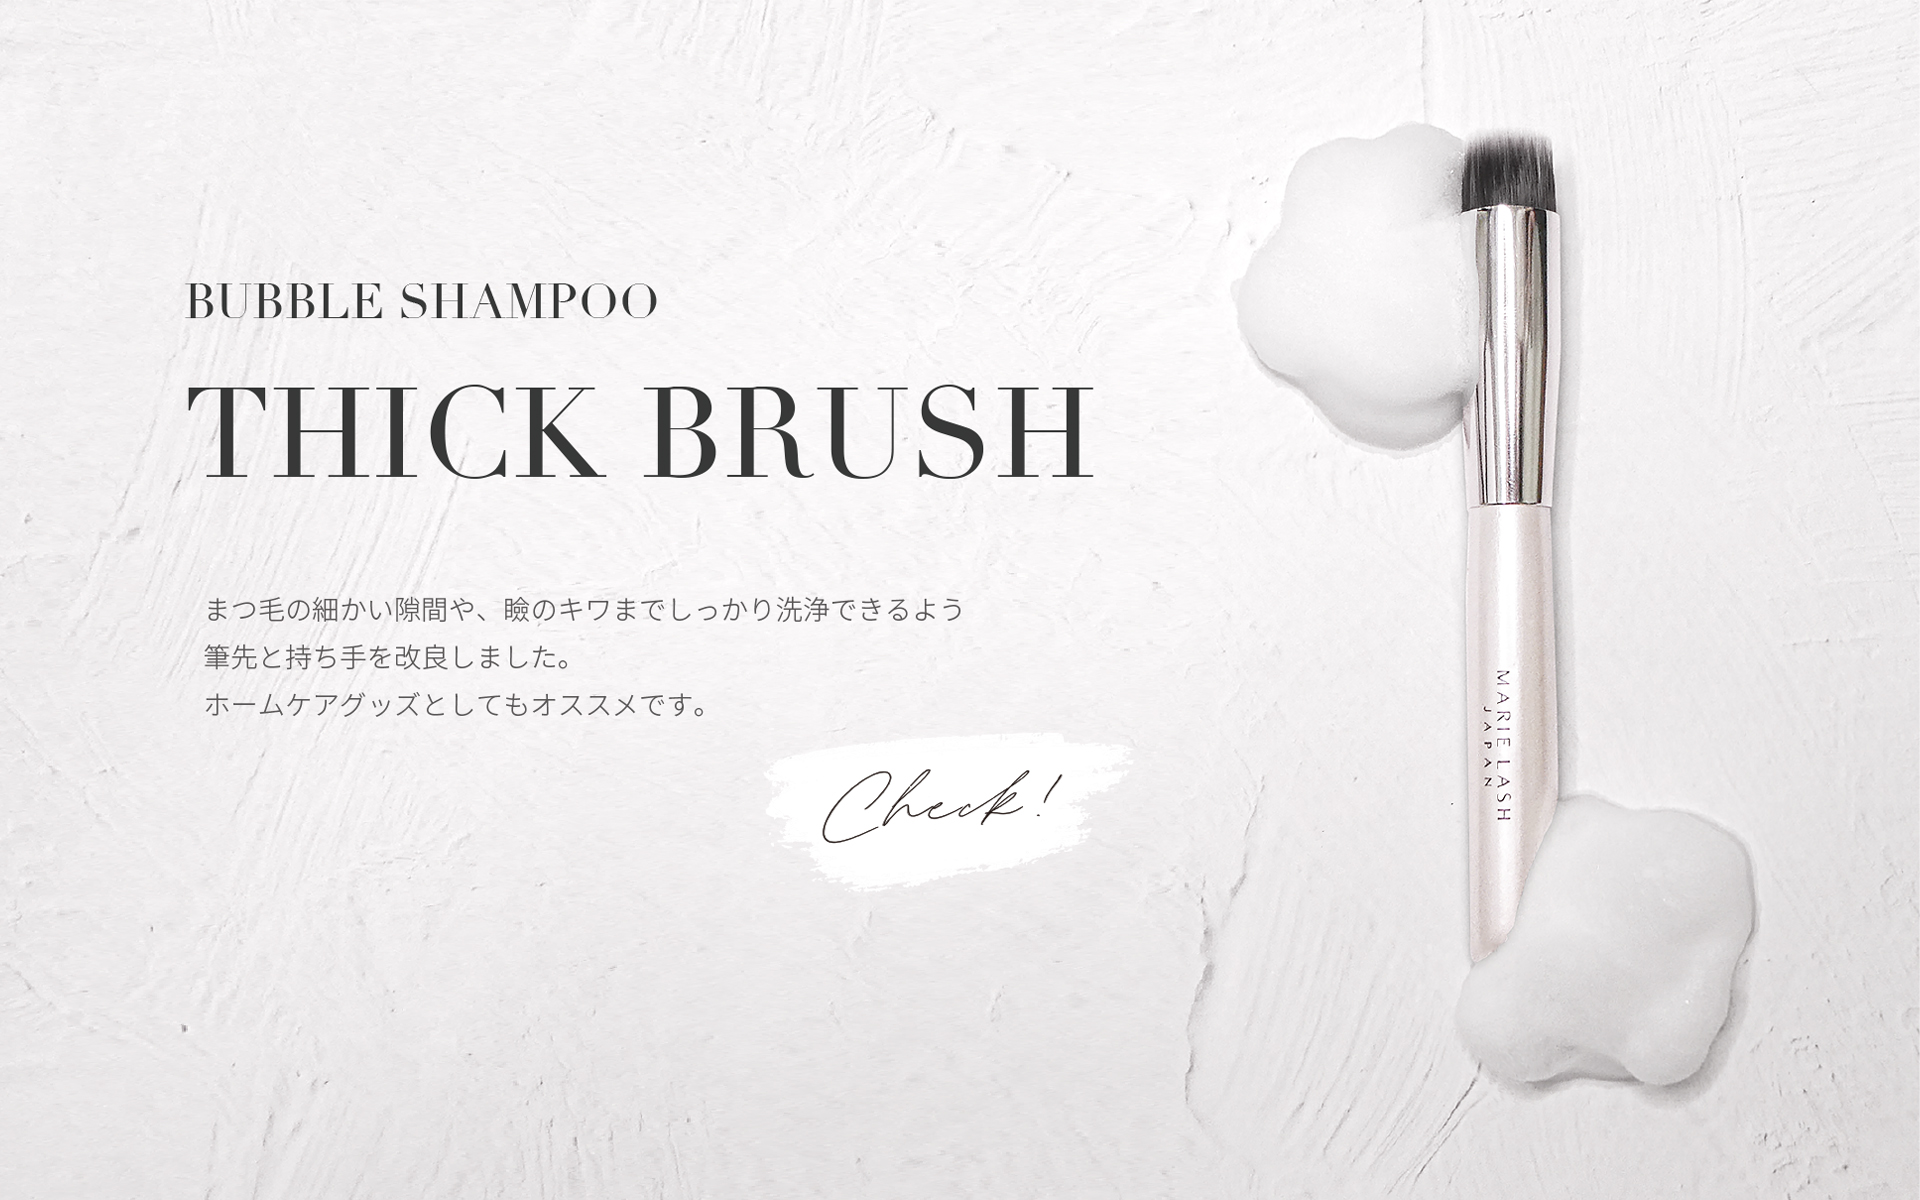 MARIE LASH JAPAN Bubble Shampoo Thick Brush